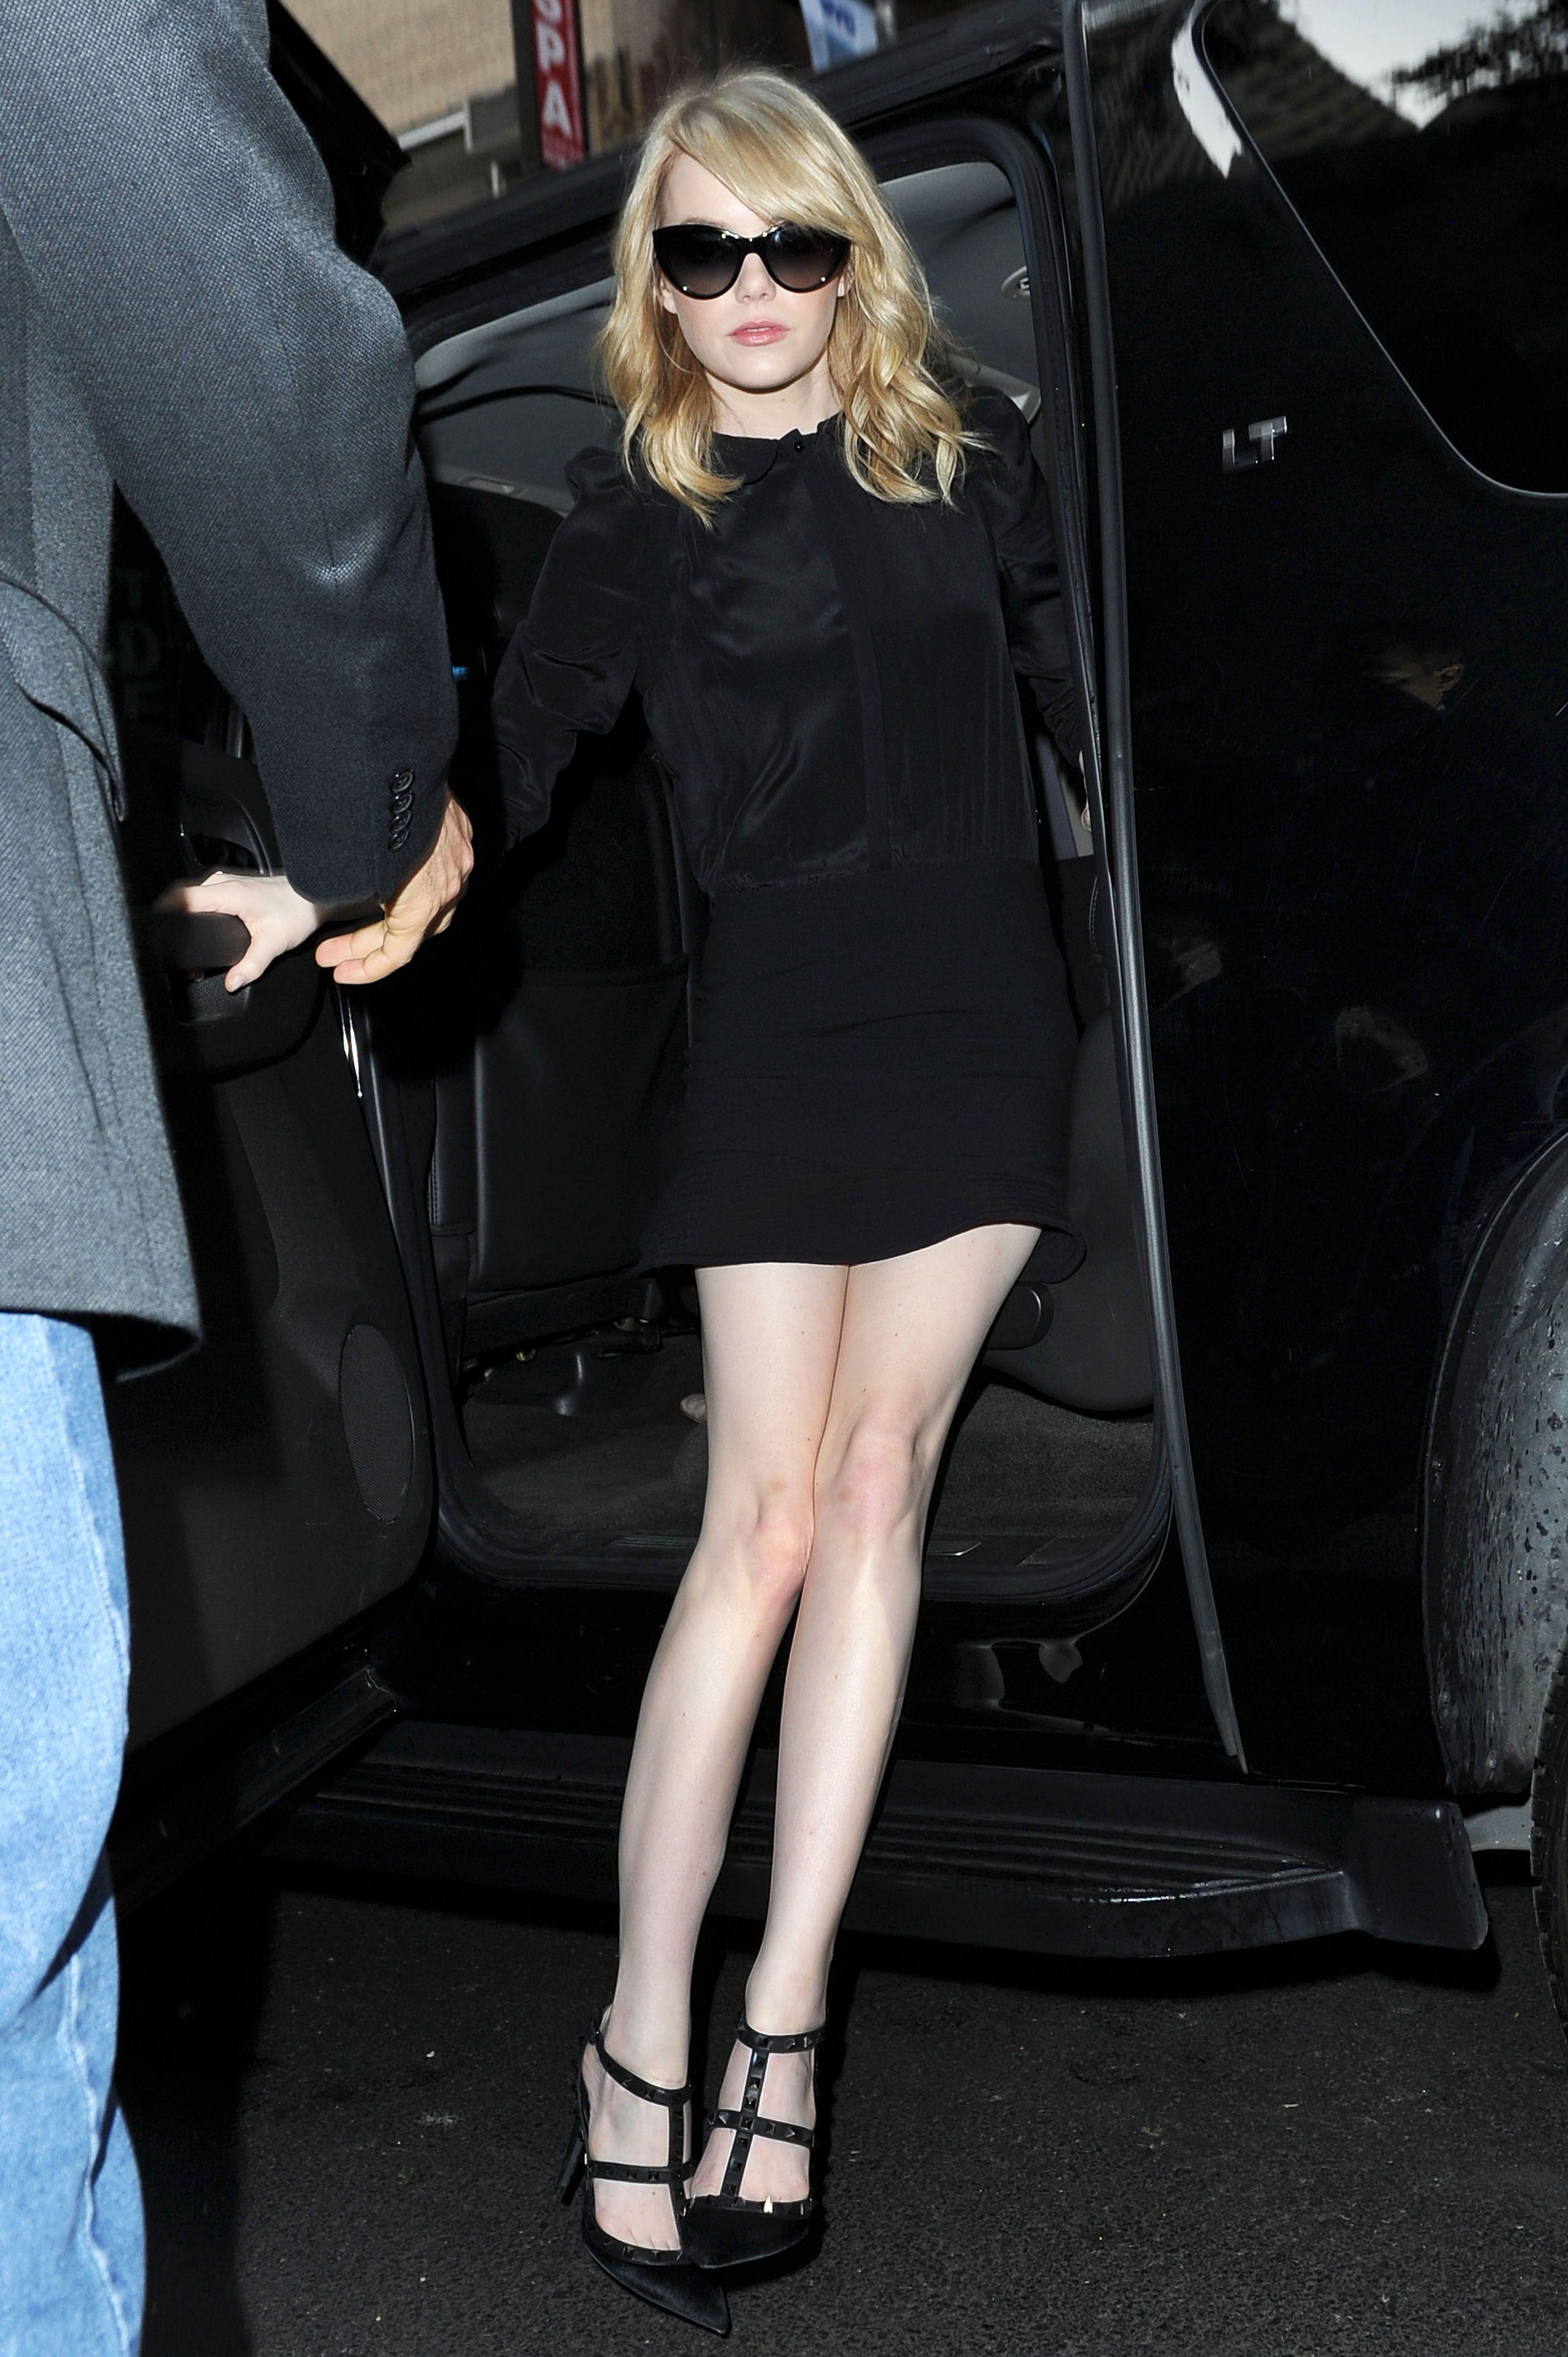 damn her flawless legs